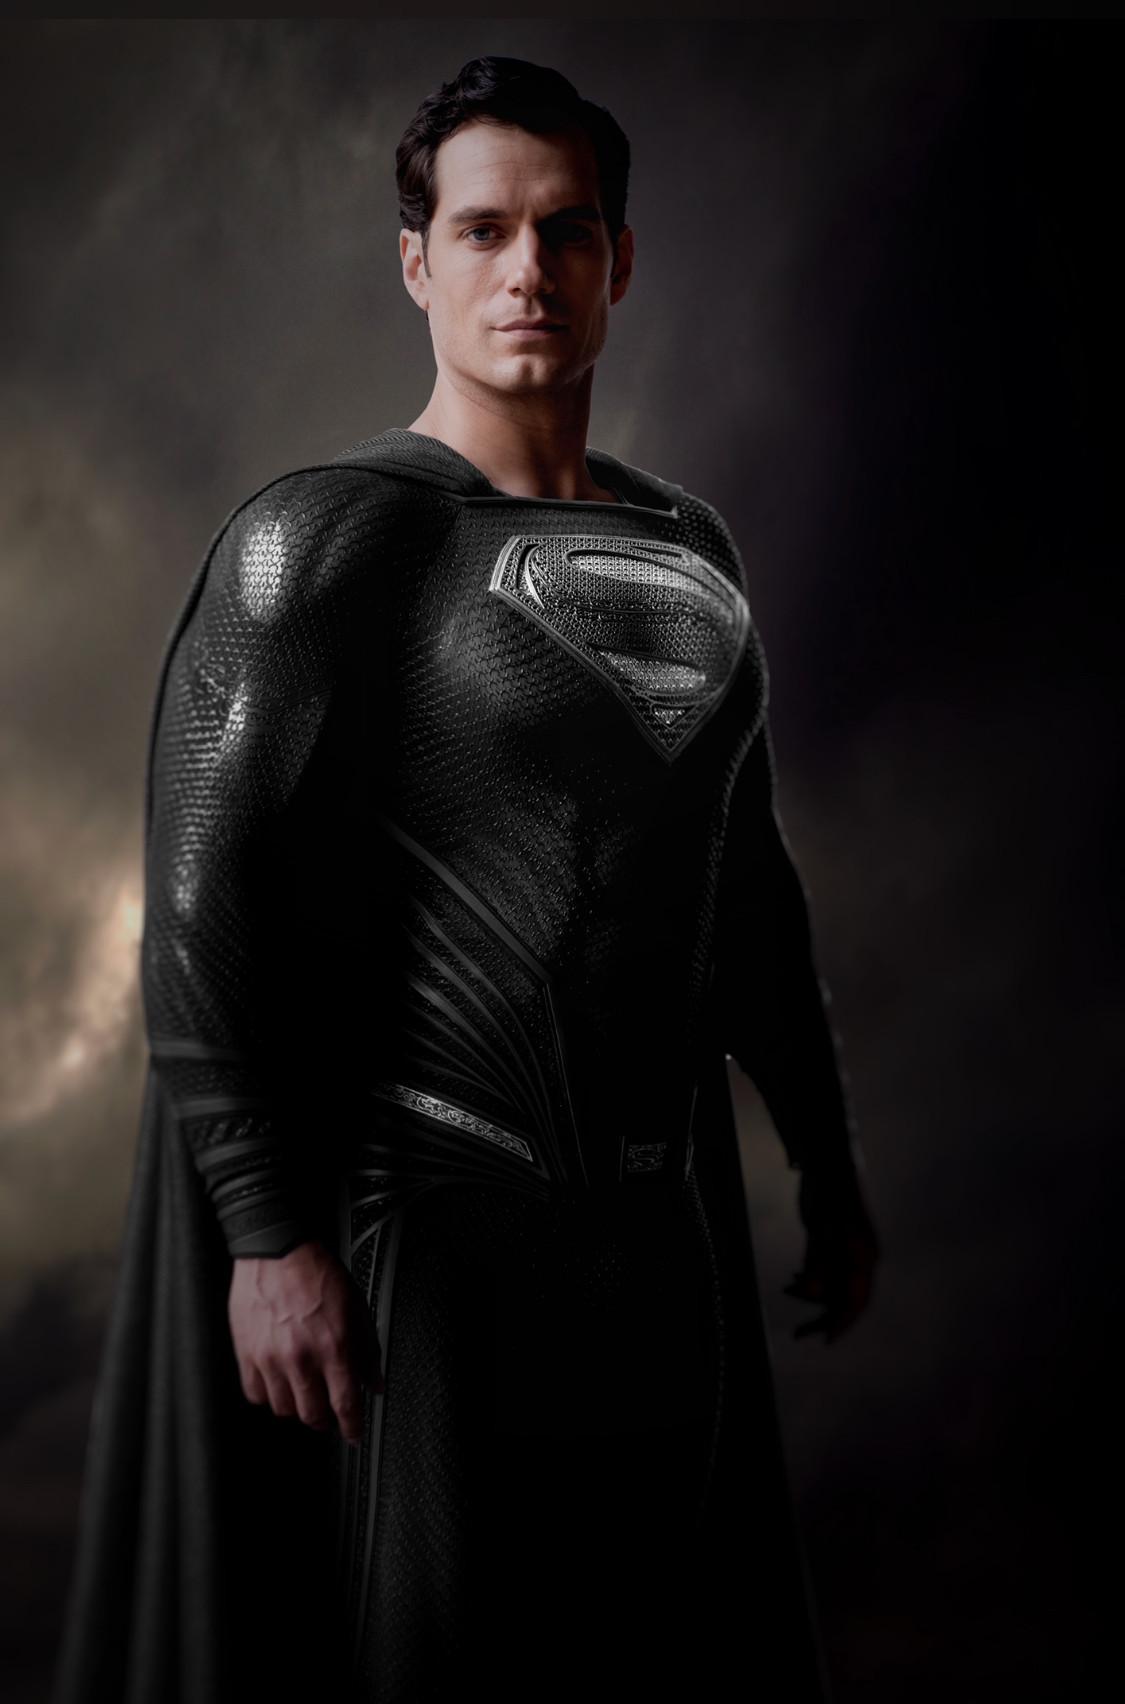 Black Suit Superman Henry Cavill Release The Sndyer Cut